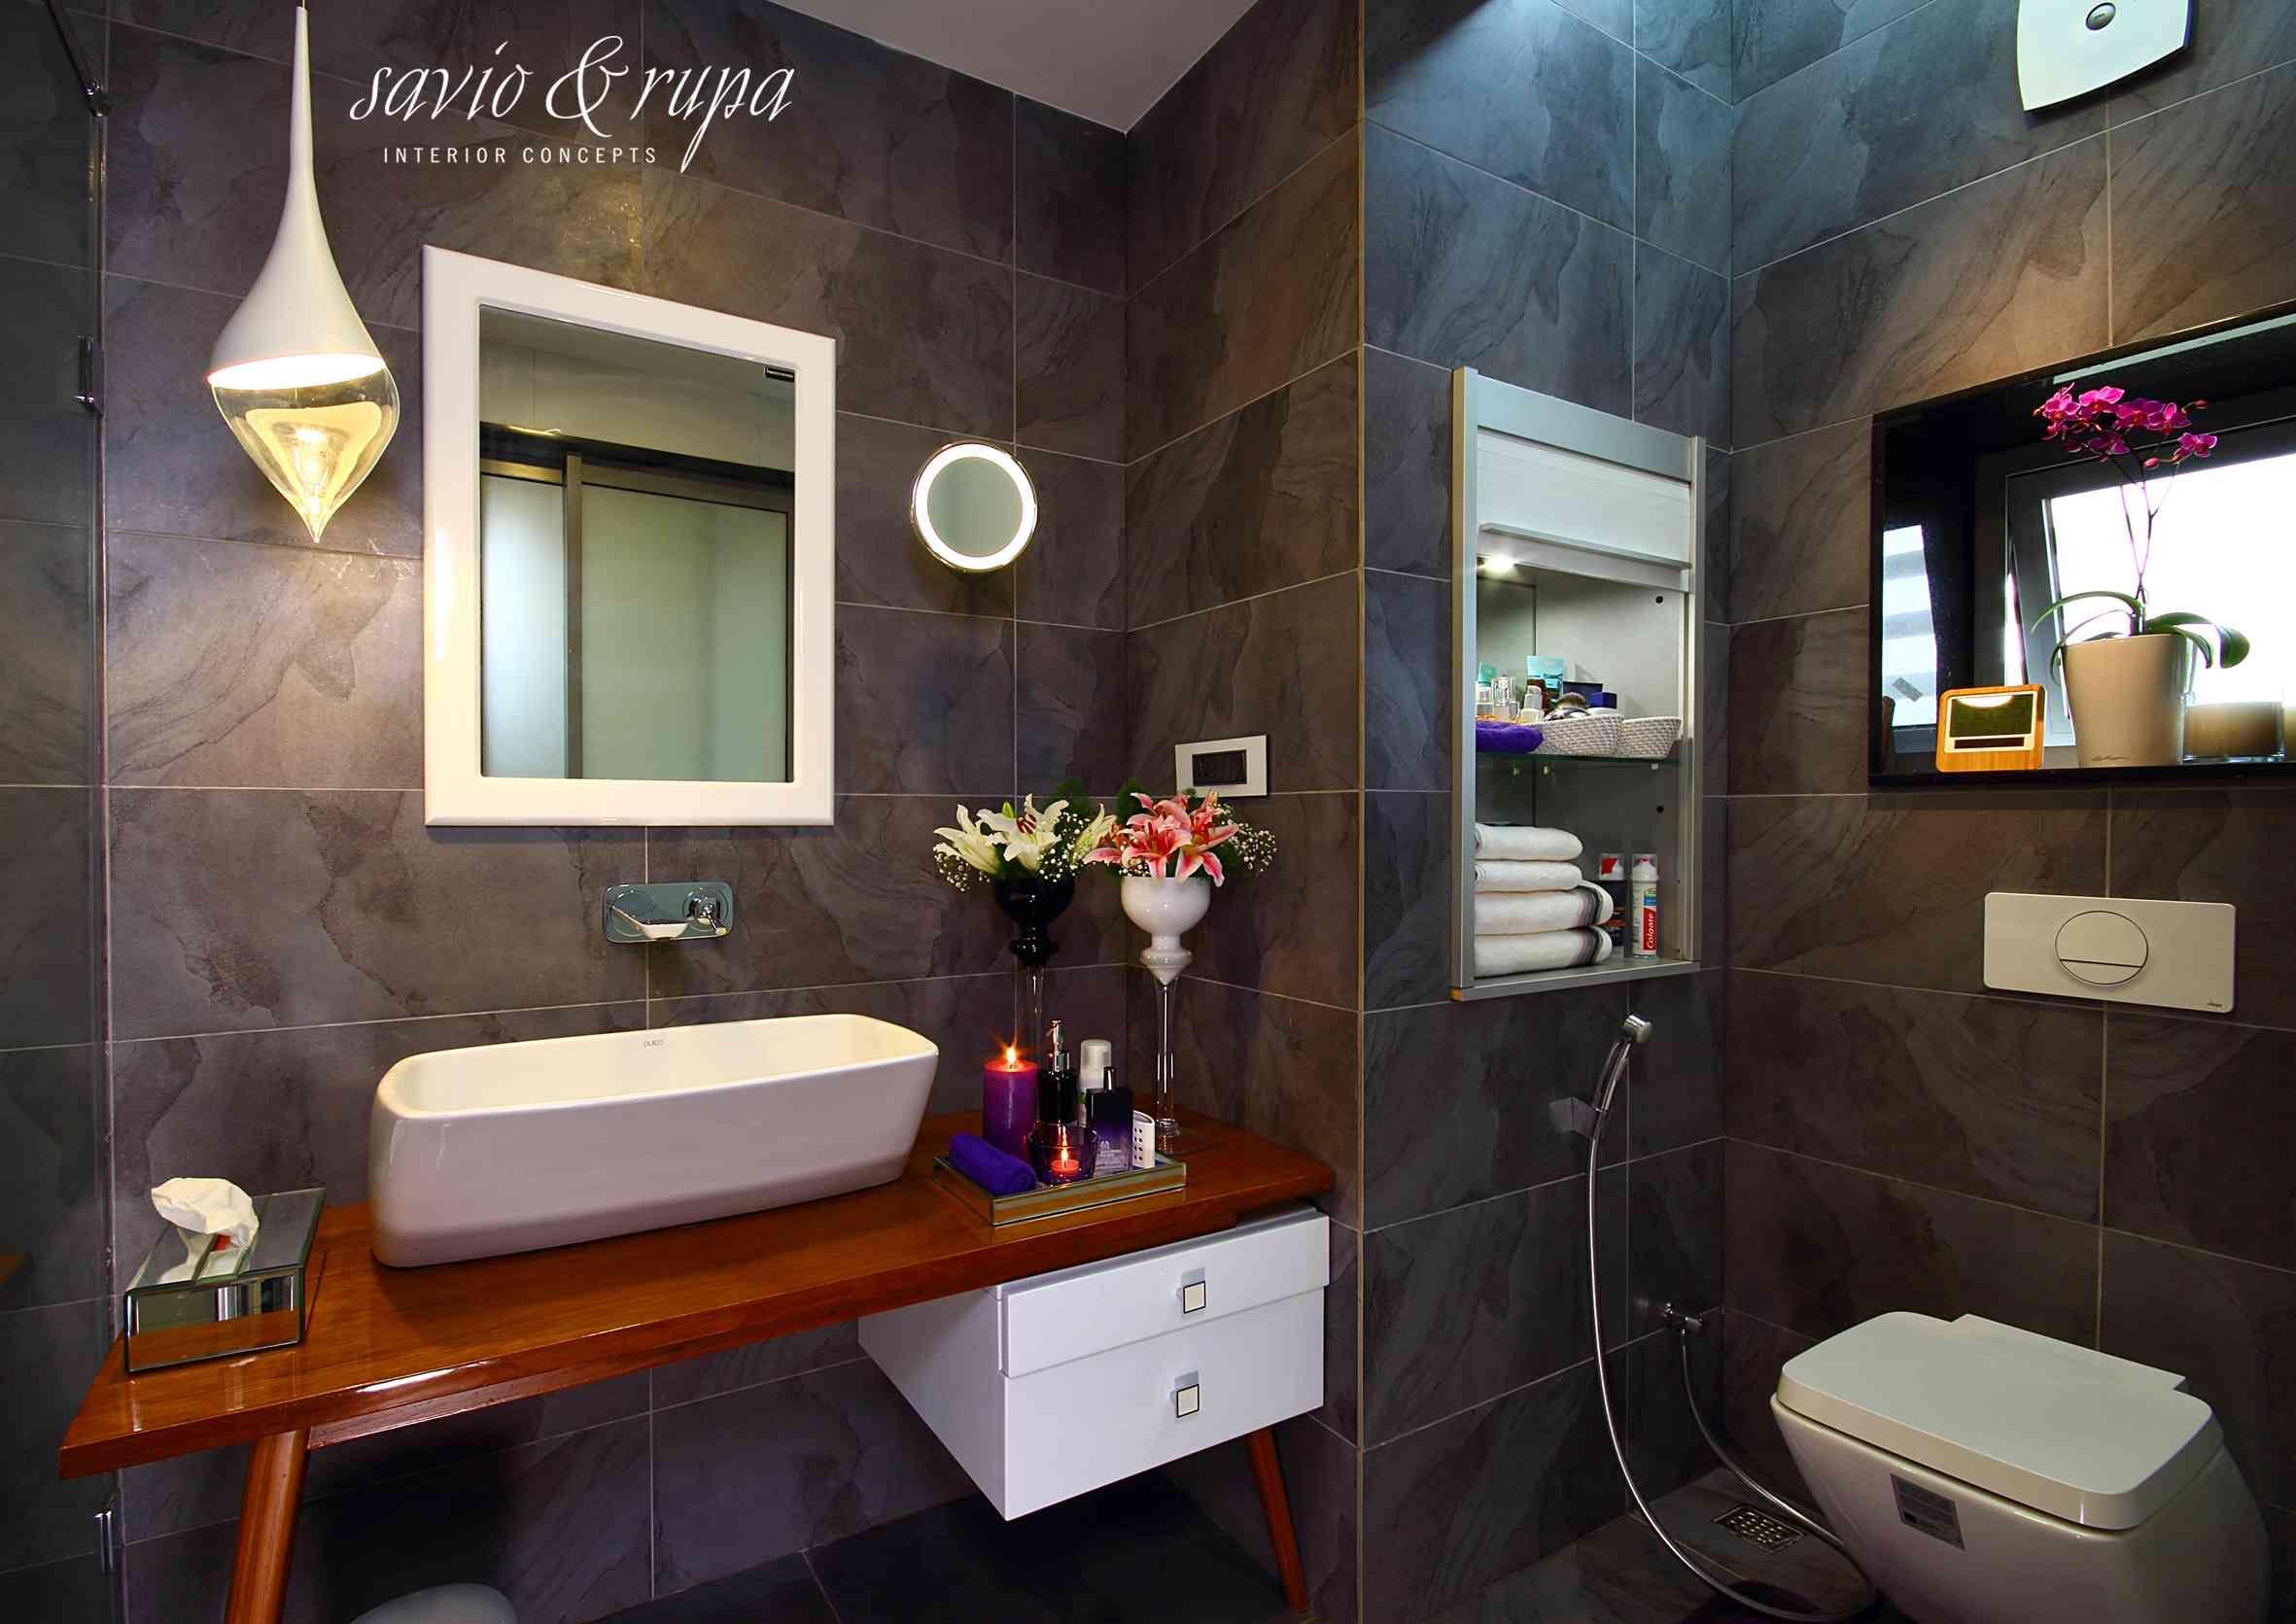 Design by savio michael | Modern bathroom design, Bathroom ...